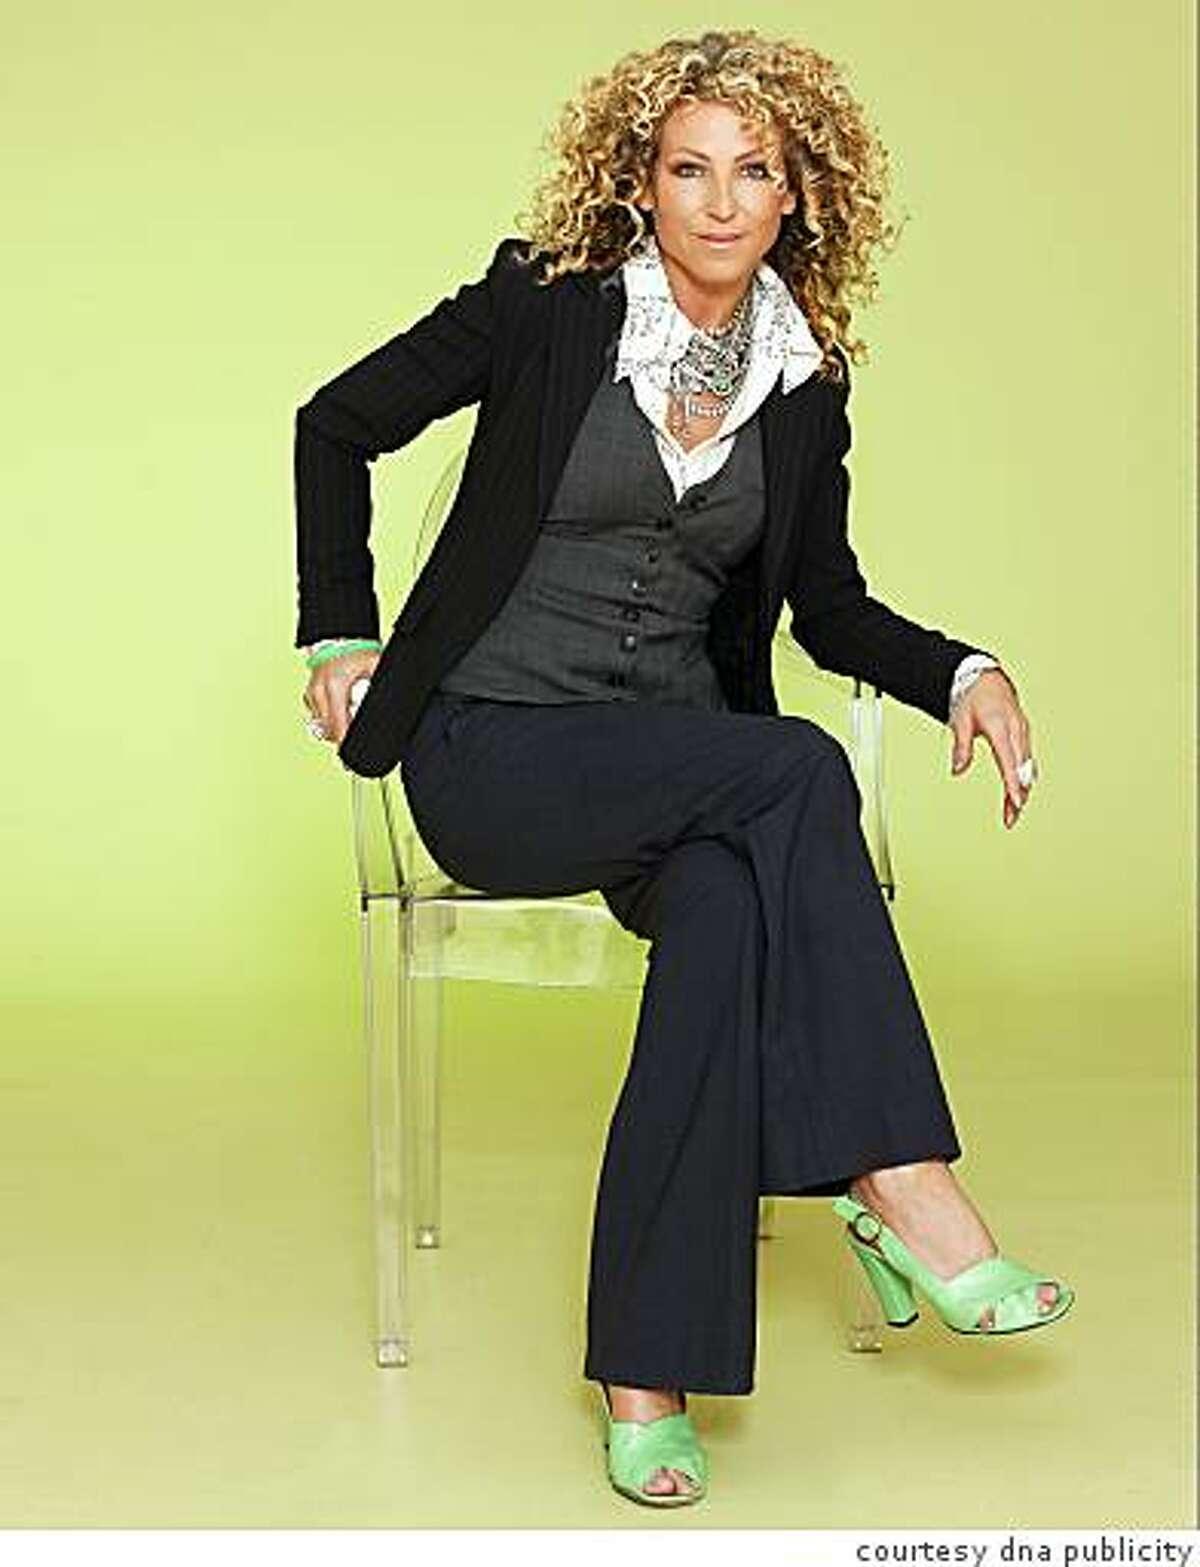 Stylist and 'no poo' guru Lorraine Massey.